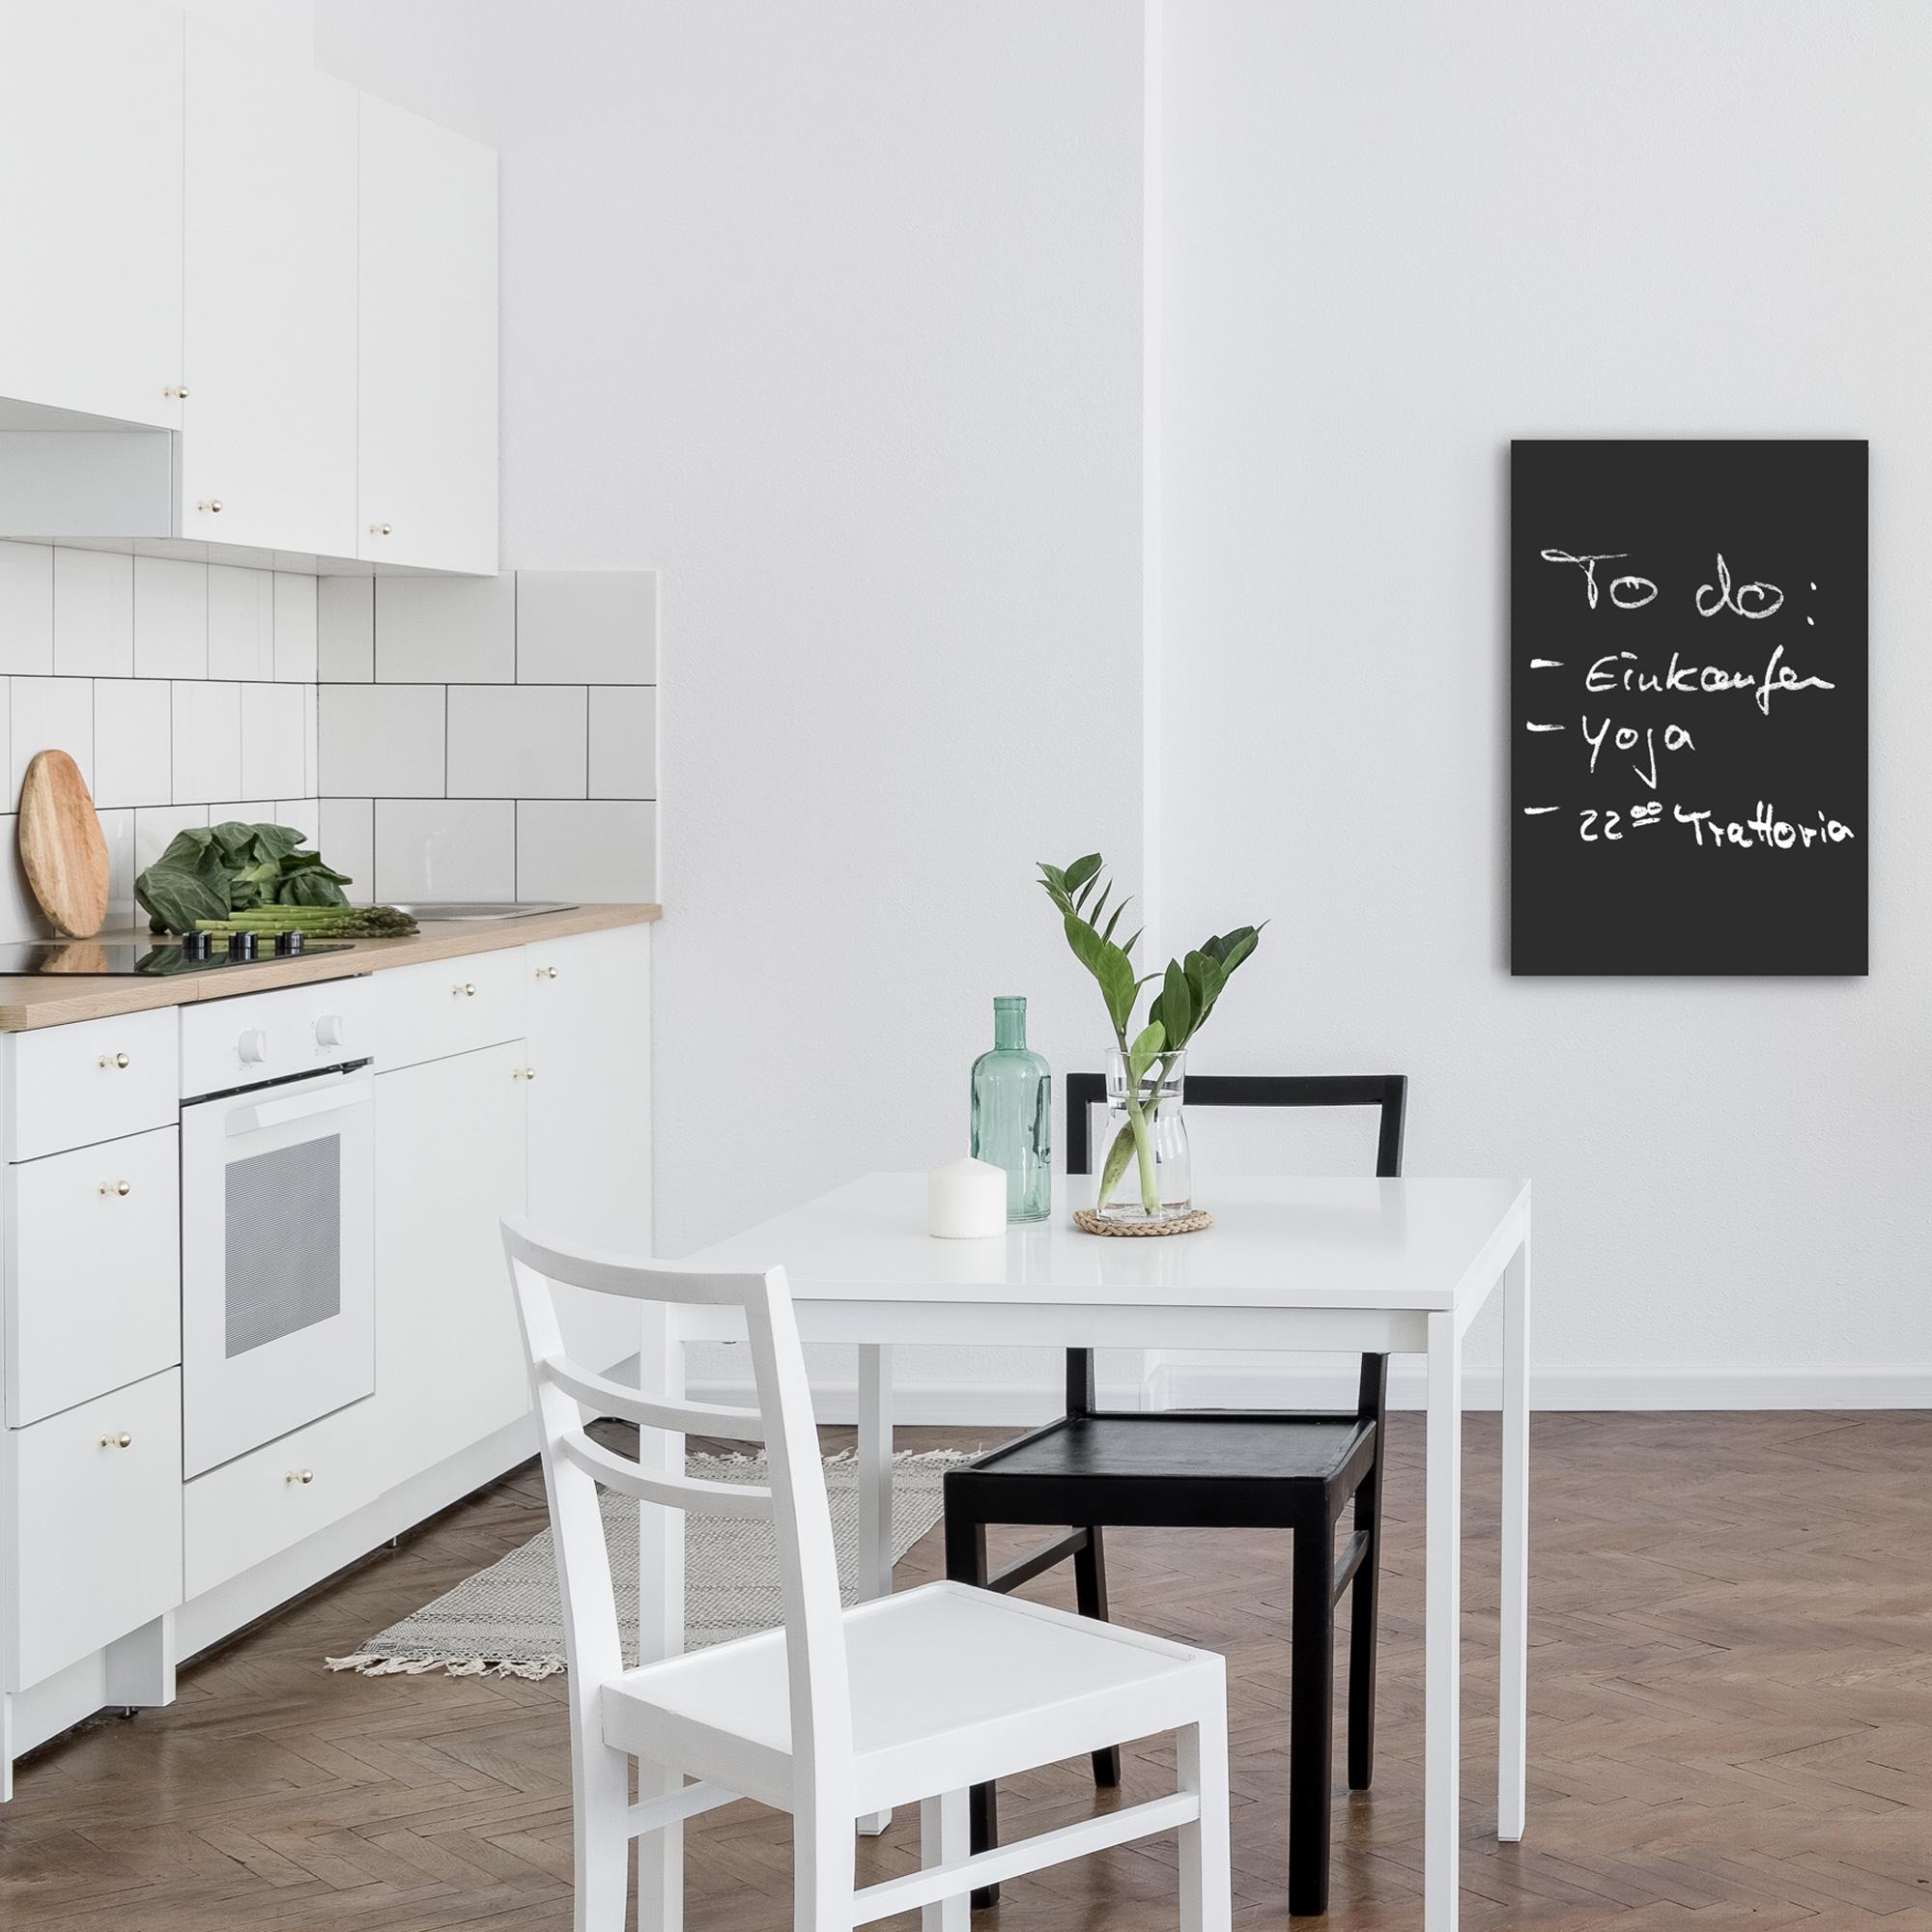 Blackboard-heater-infrared-wall-mounted-vasner-citara-t